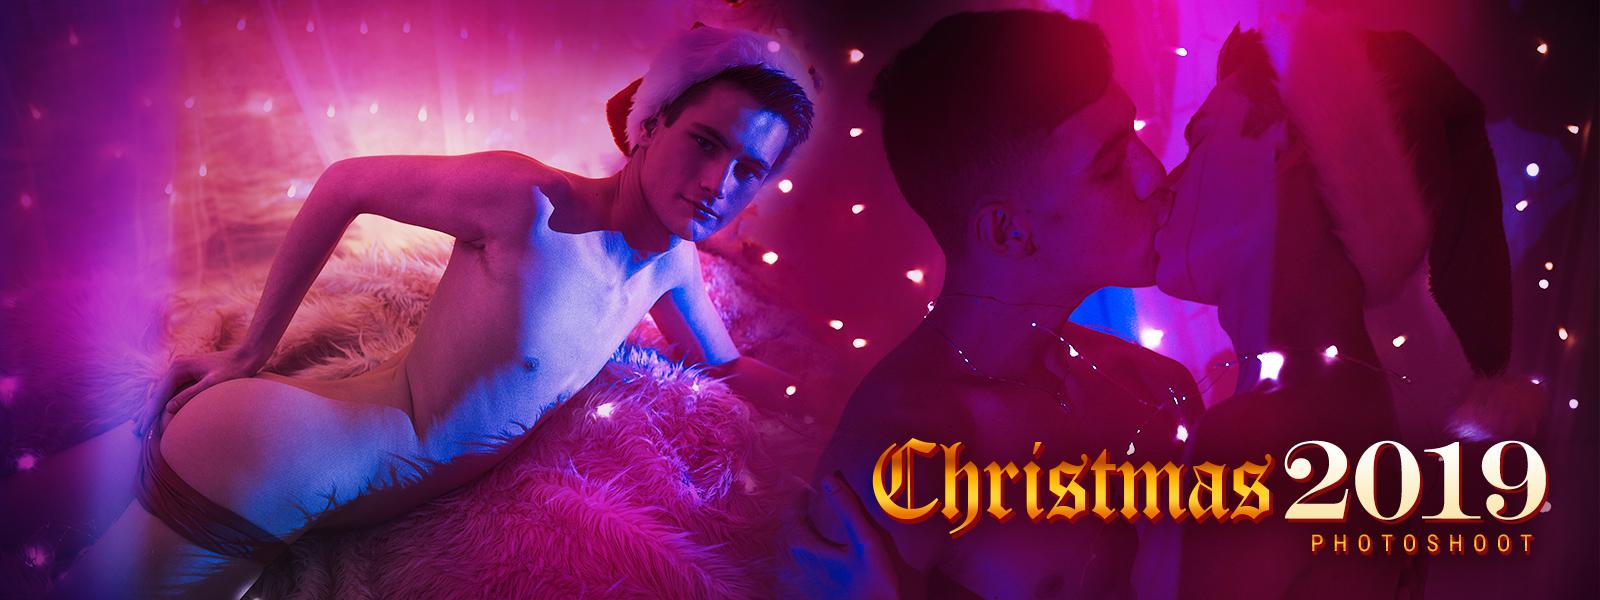 Christmas 2019 Photoshoot